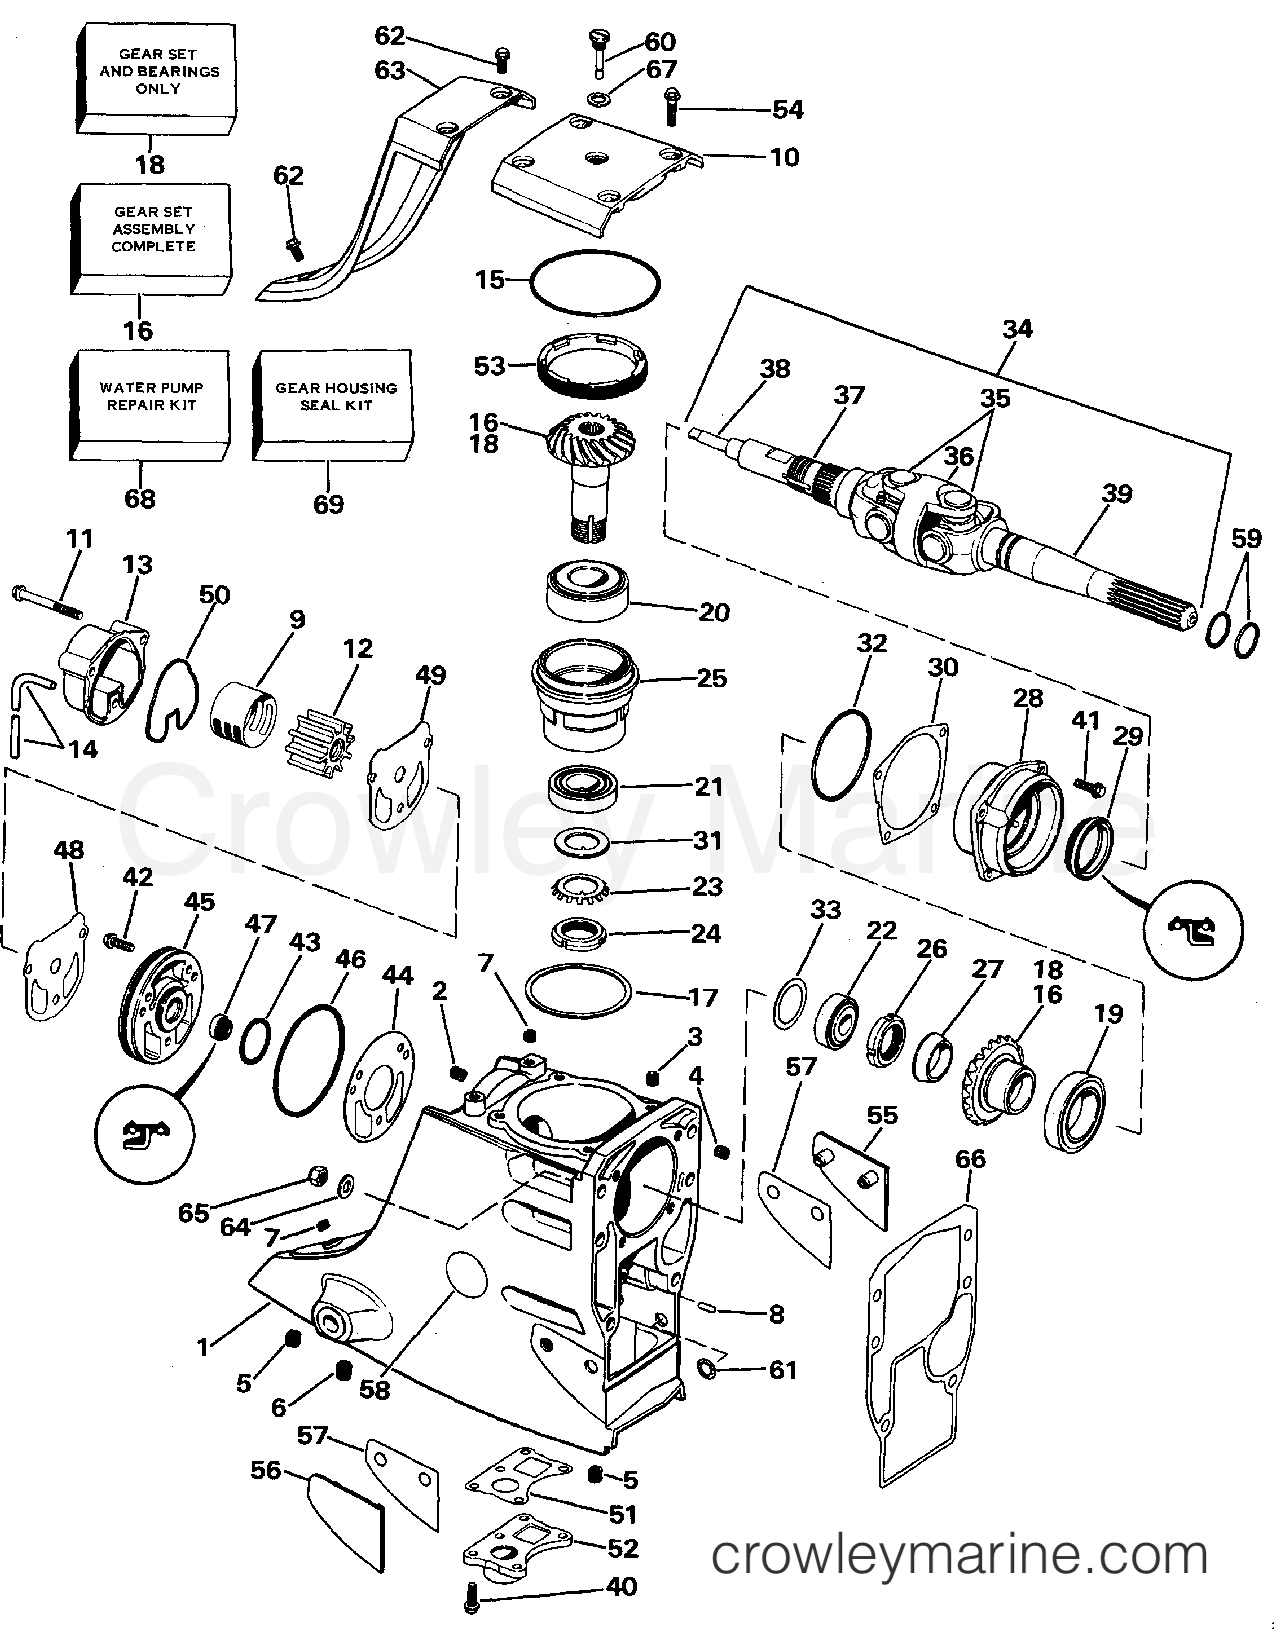 1988 OMC Stern Drive 2.3 - 232AMRGDE - UPPER GEAR HOUSING section